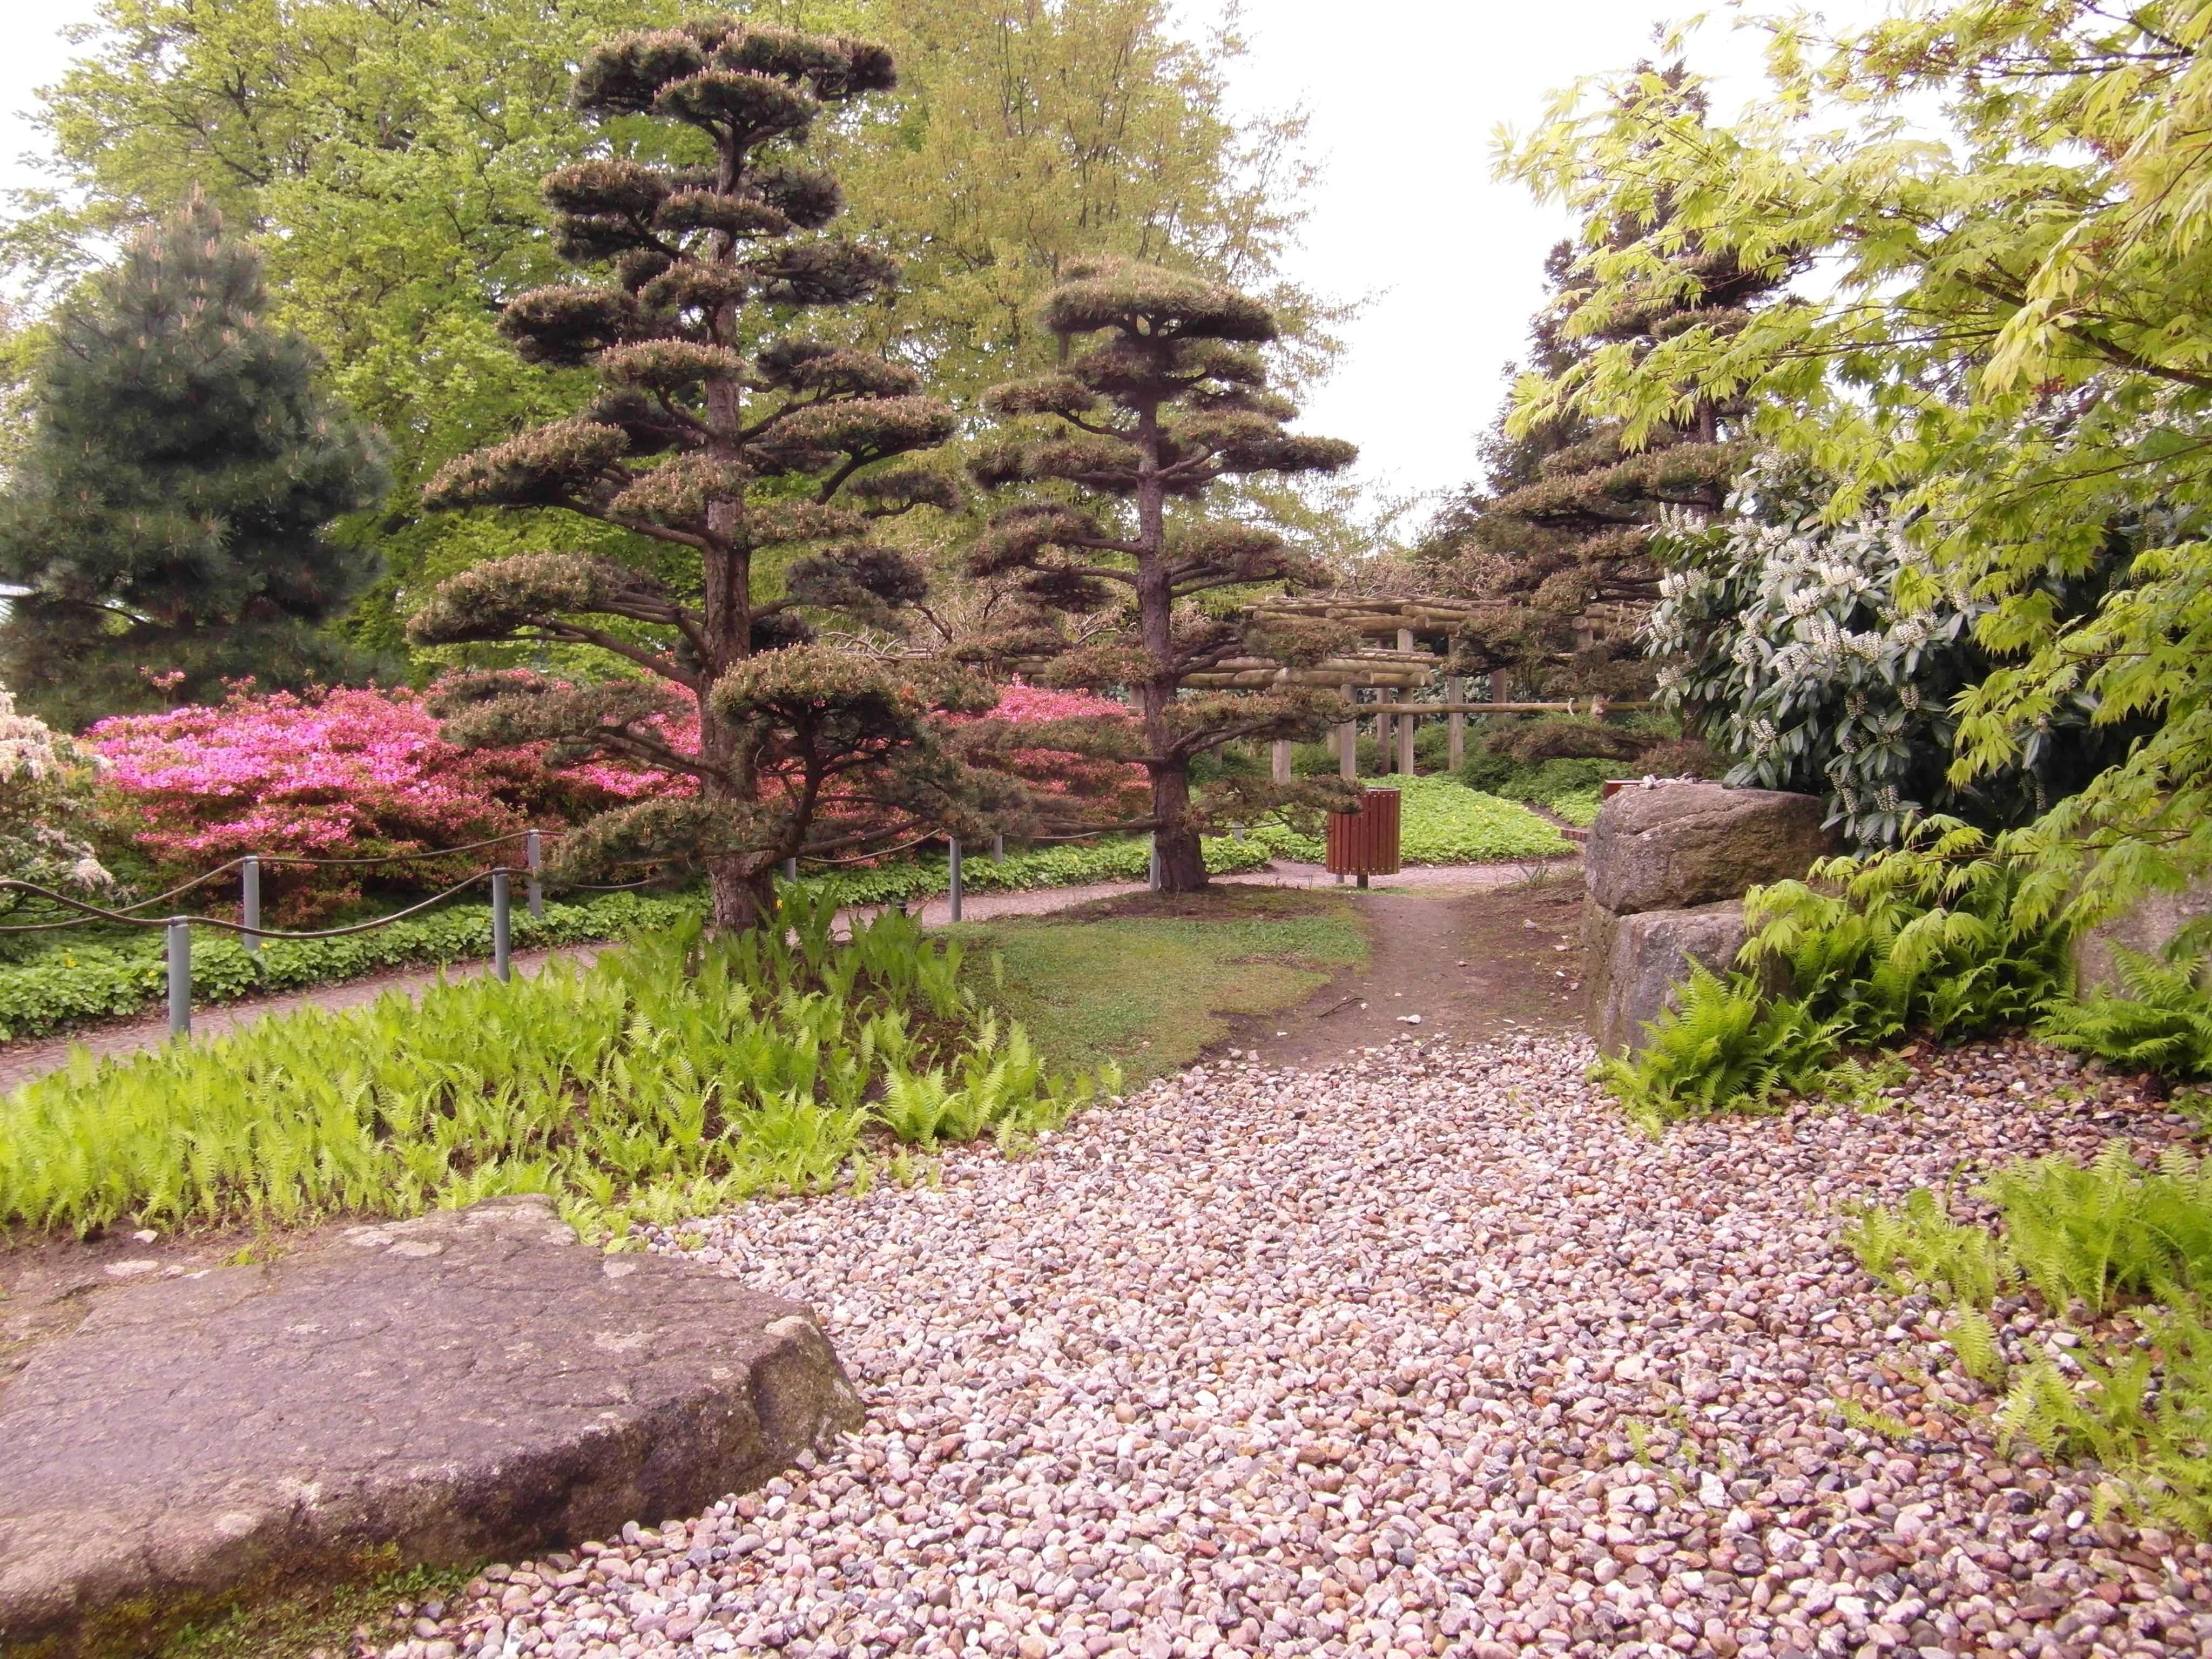 Japanese Garden Landscaping Free Images Tree Lawn Flower Park Botany Japanese Garden